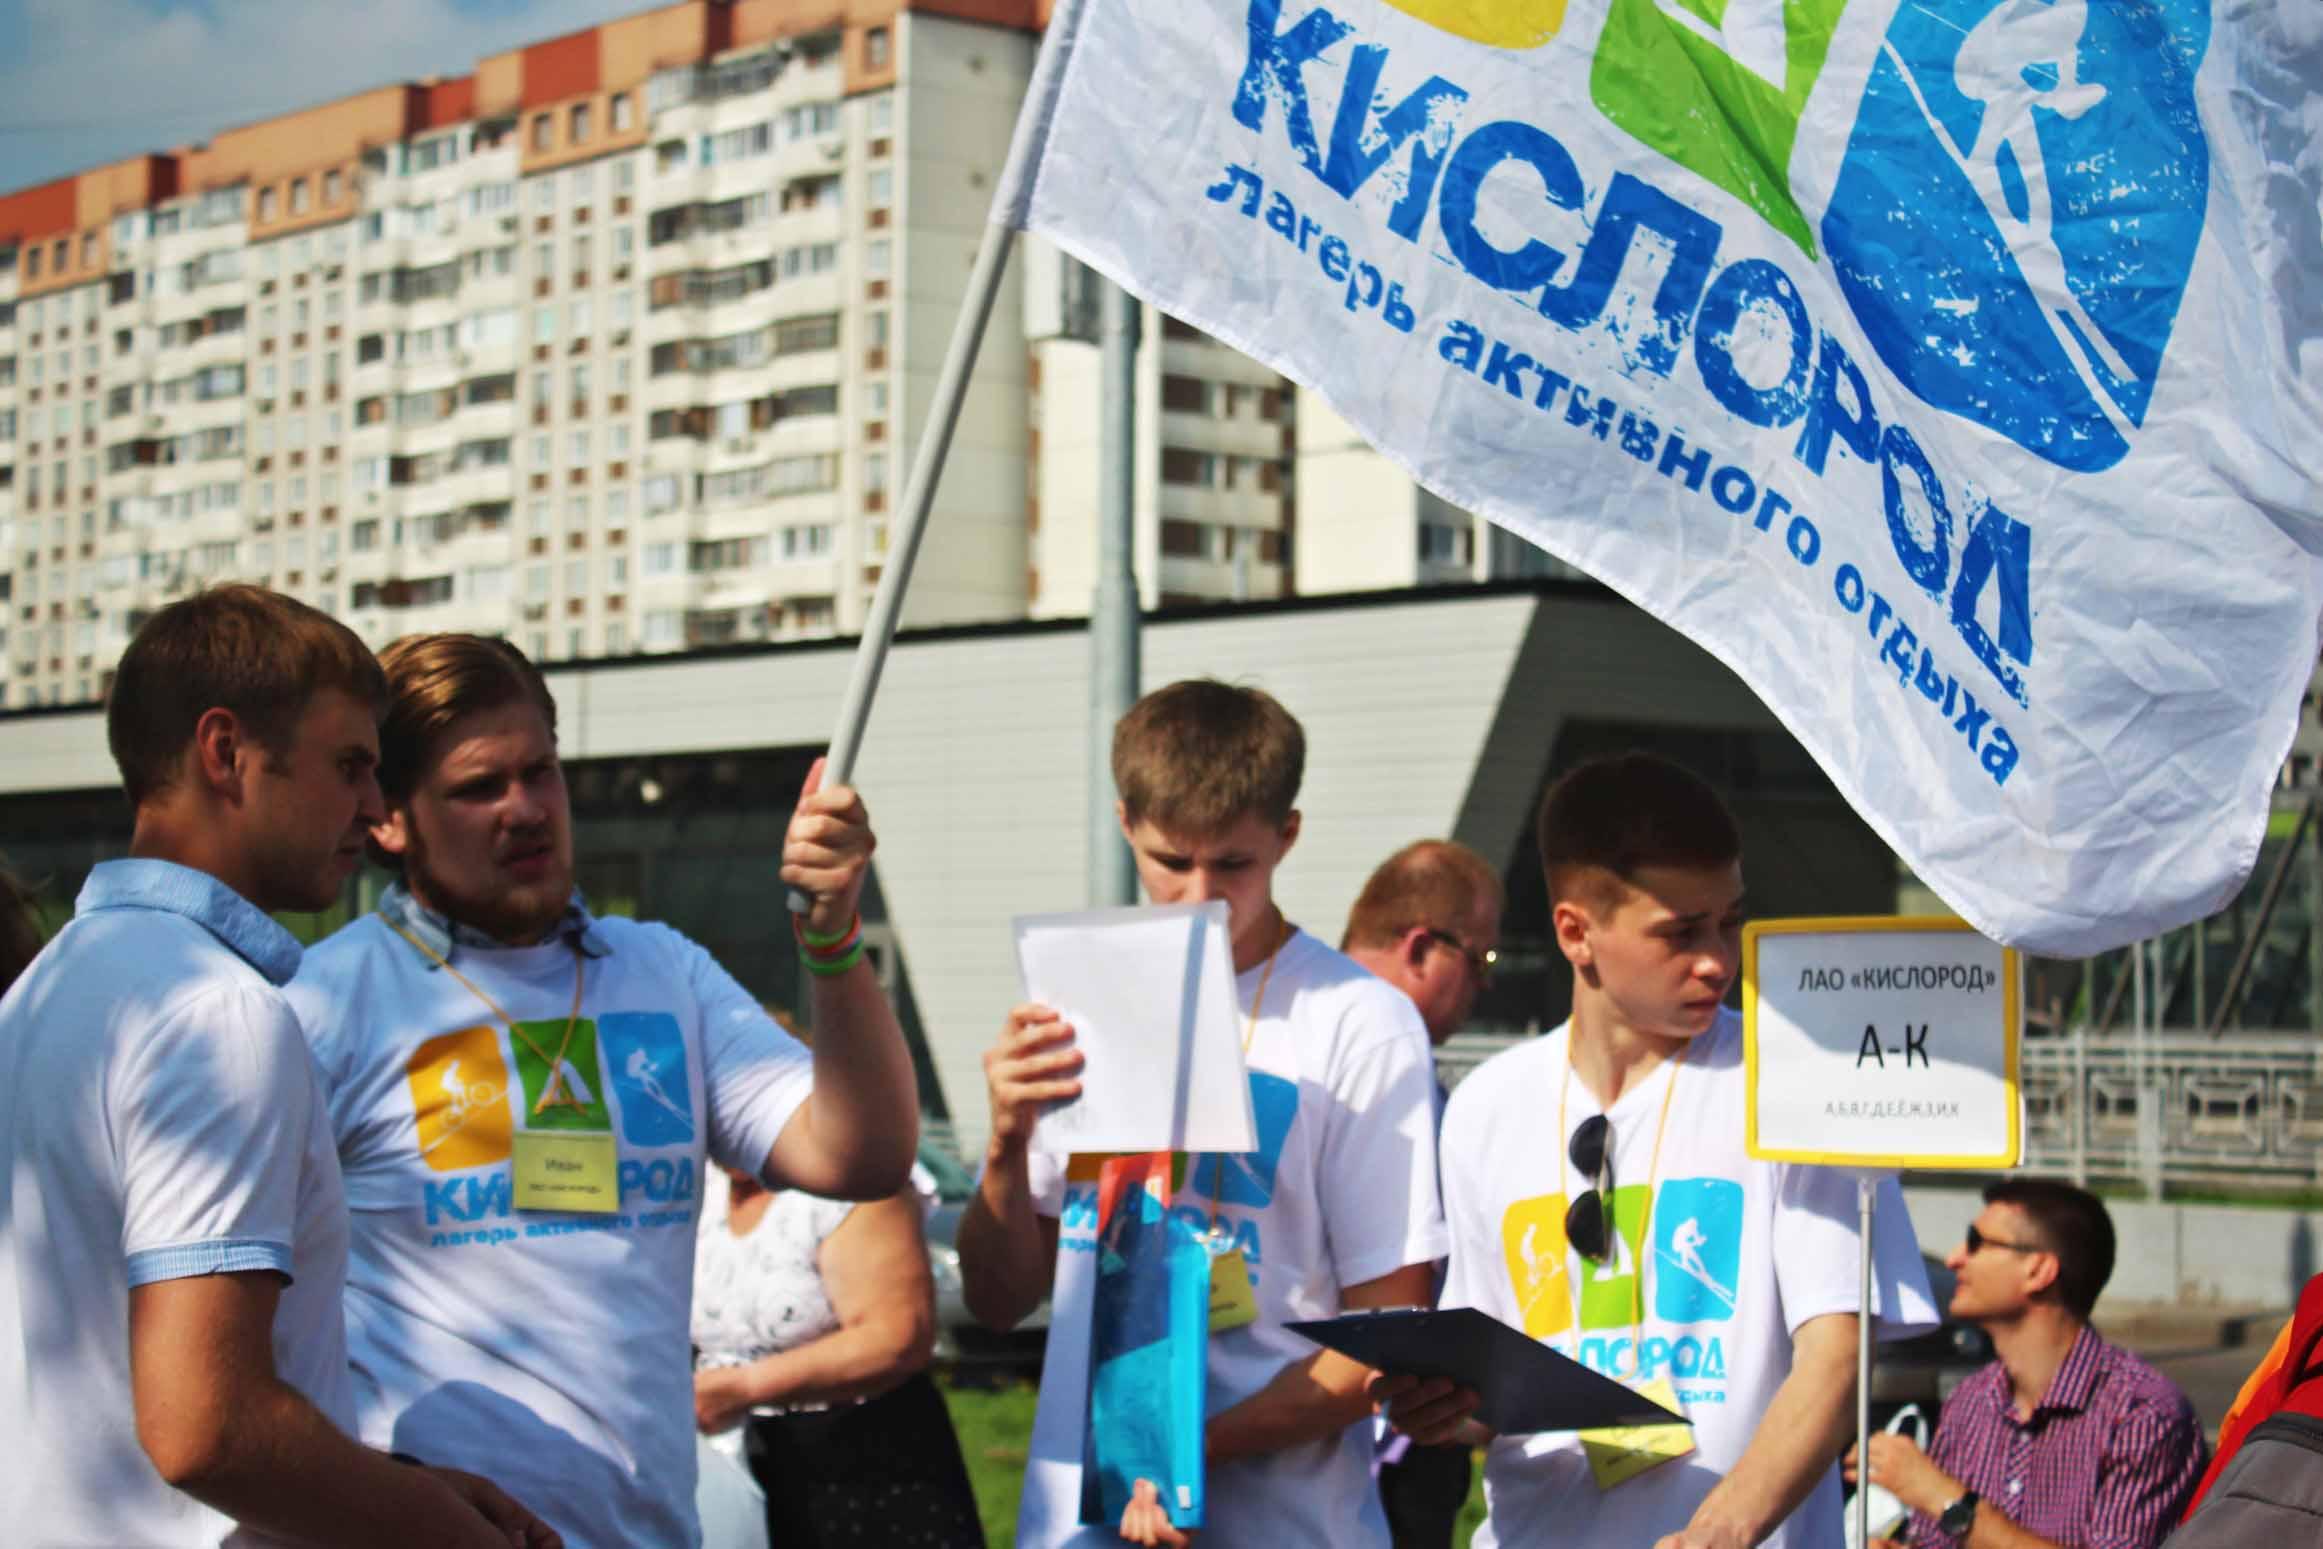 10 Otpravka Flag Kislorod